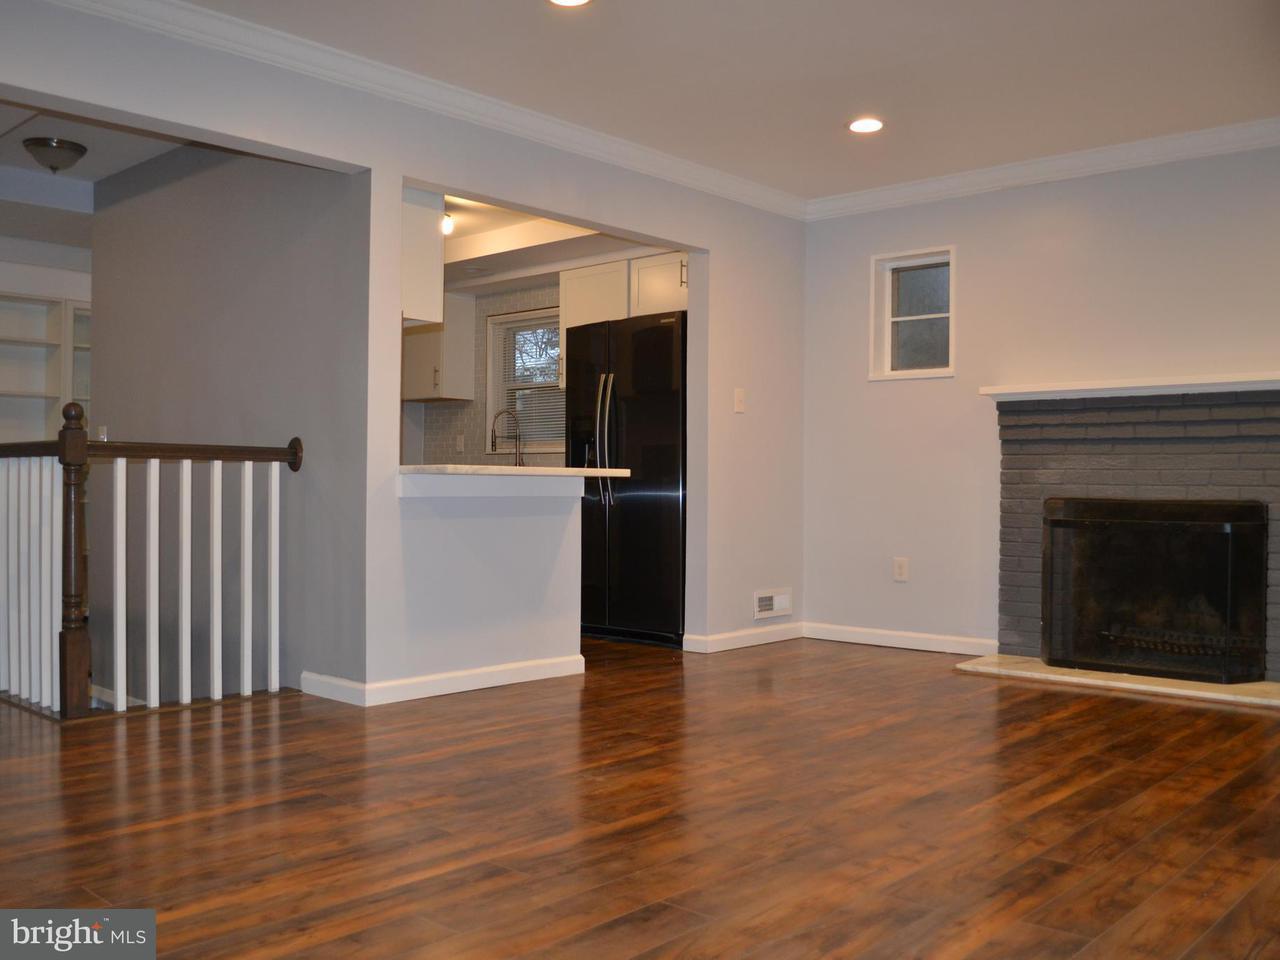 Additional photo for property listing at 3721 Richard Avenue 3721 Richard Avenue Fairfax, 버지니아 22031 미국